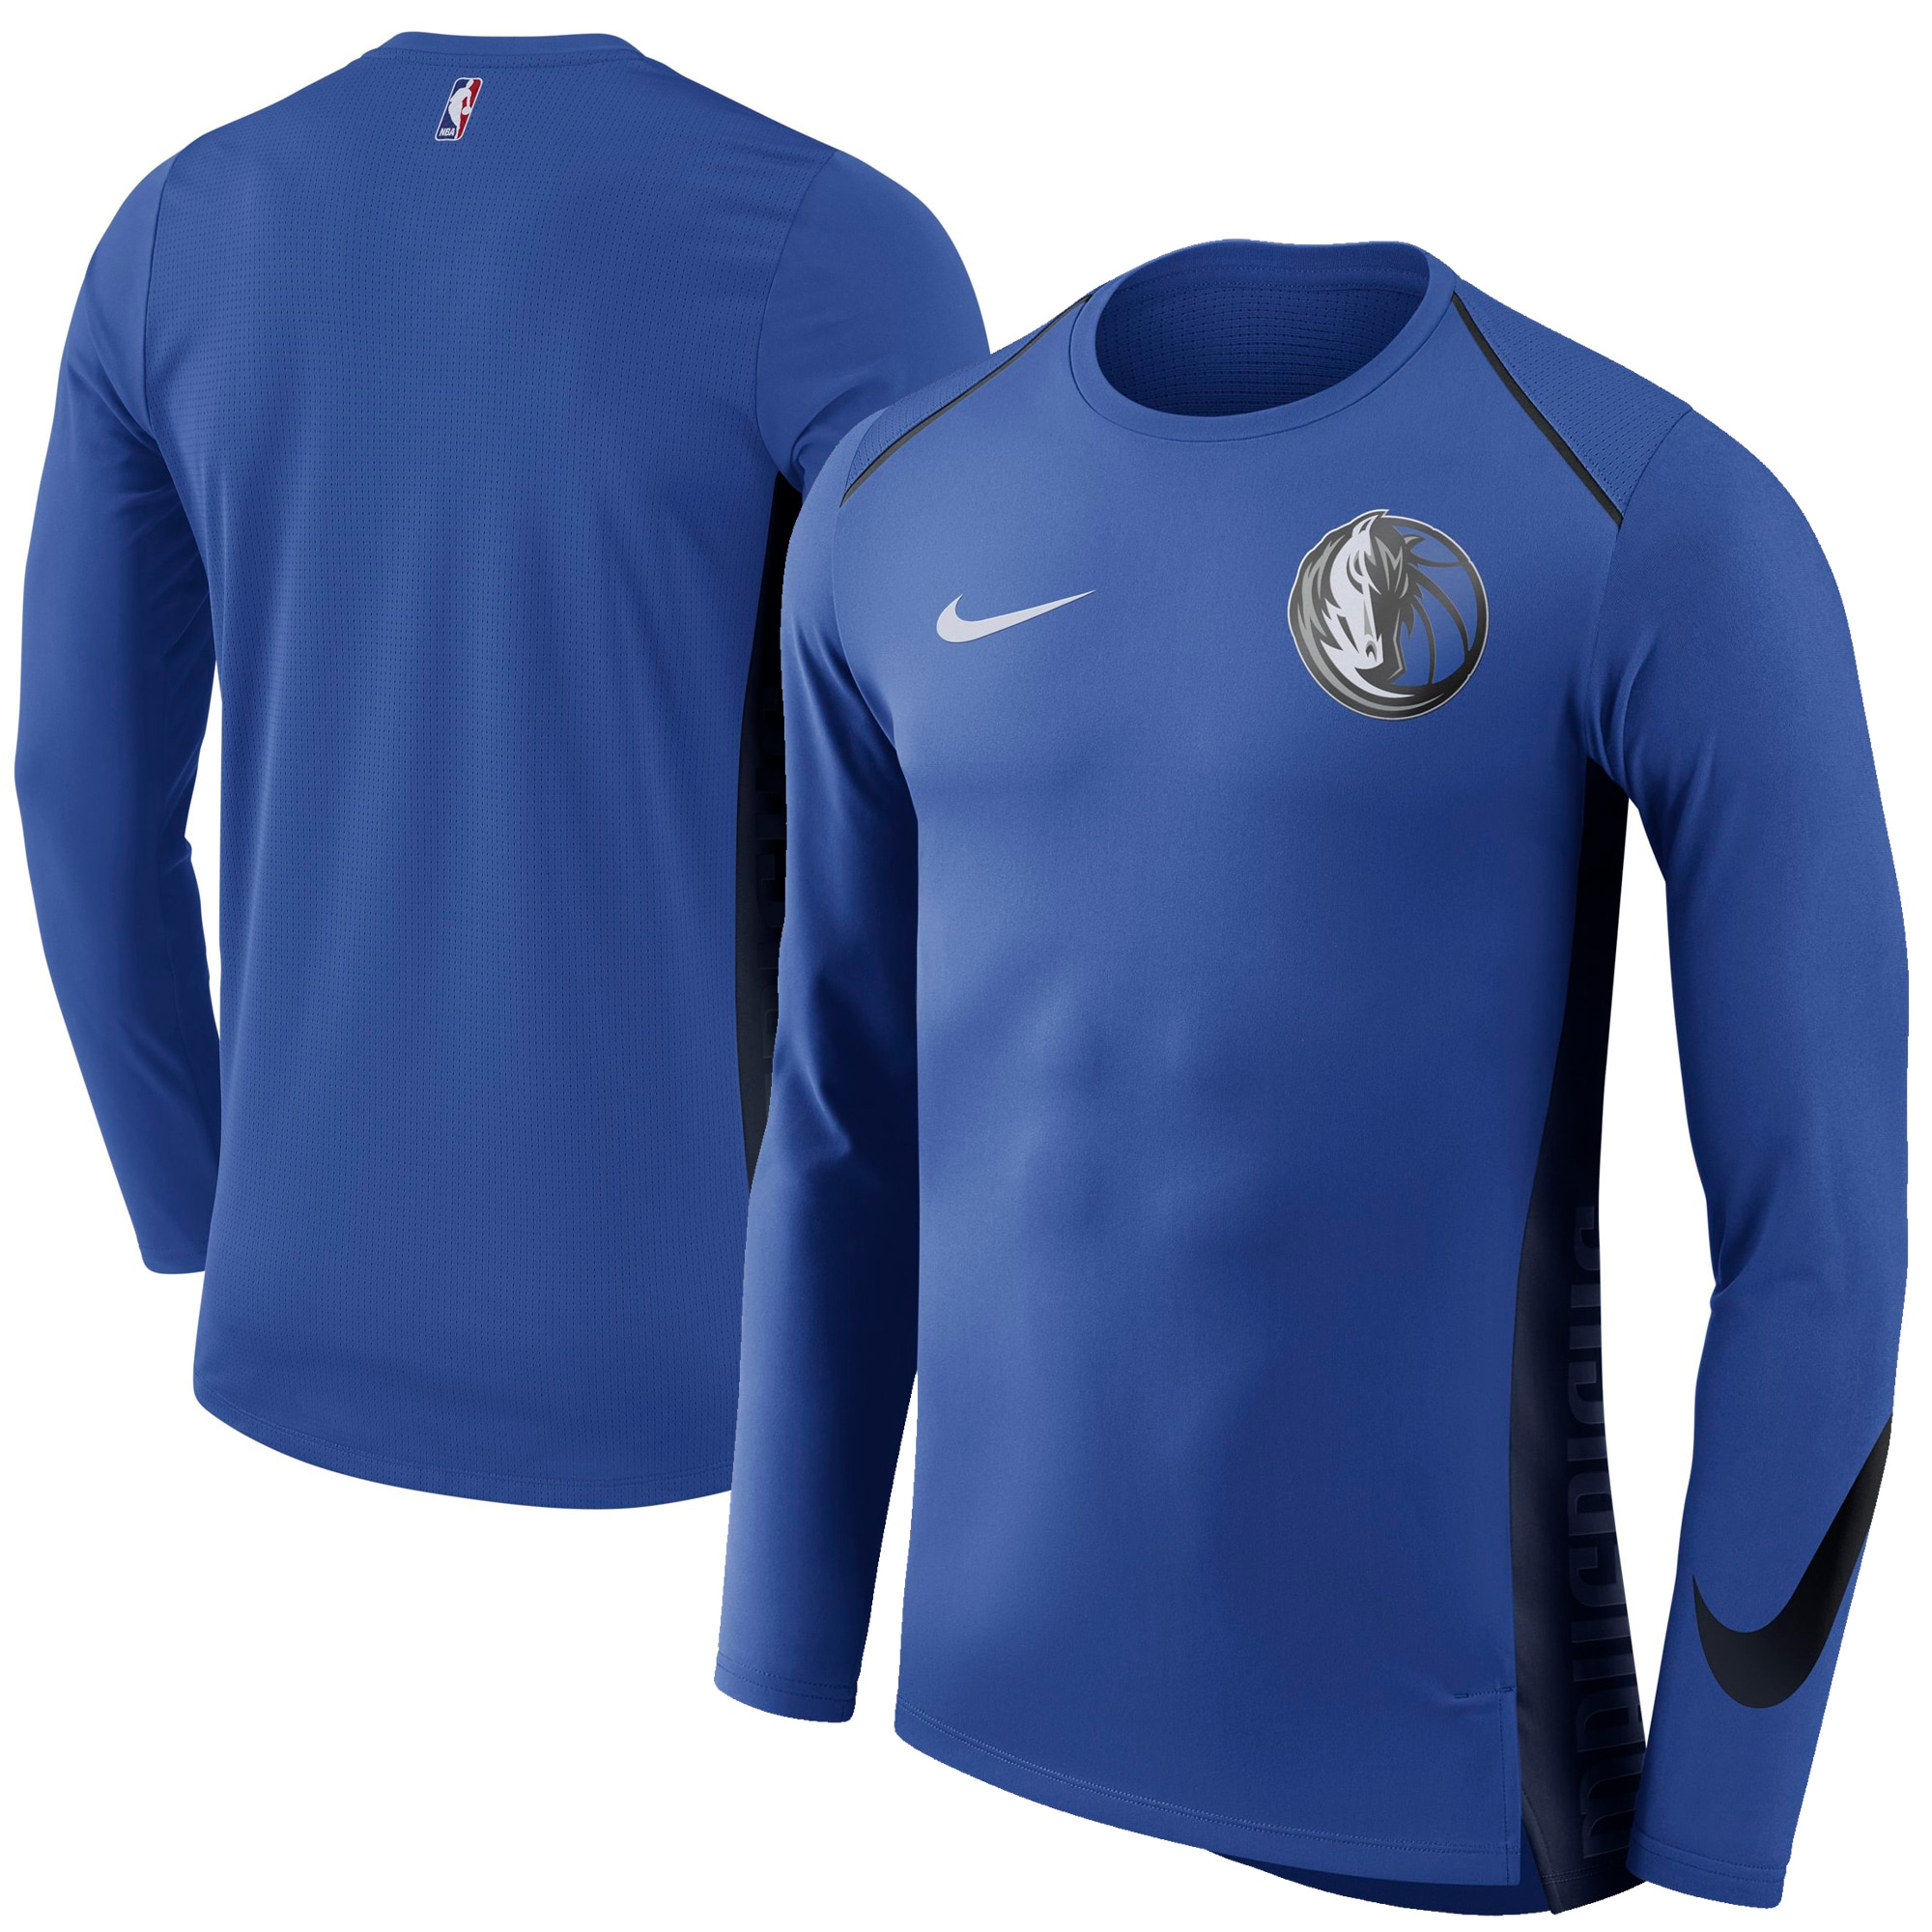 Dallas Mavericks Nike Elite Shooter Performance Long Sleeve T-Shirt - Royal